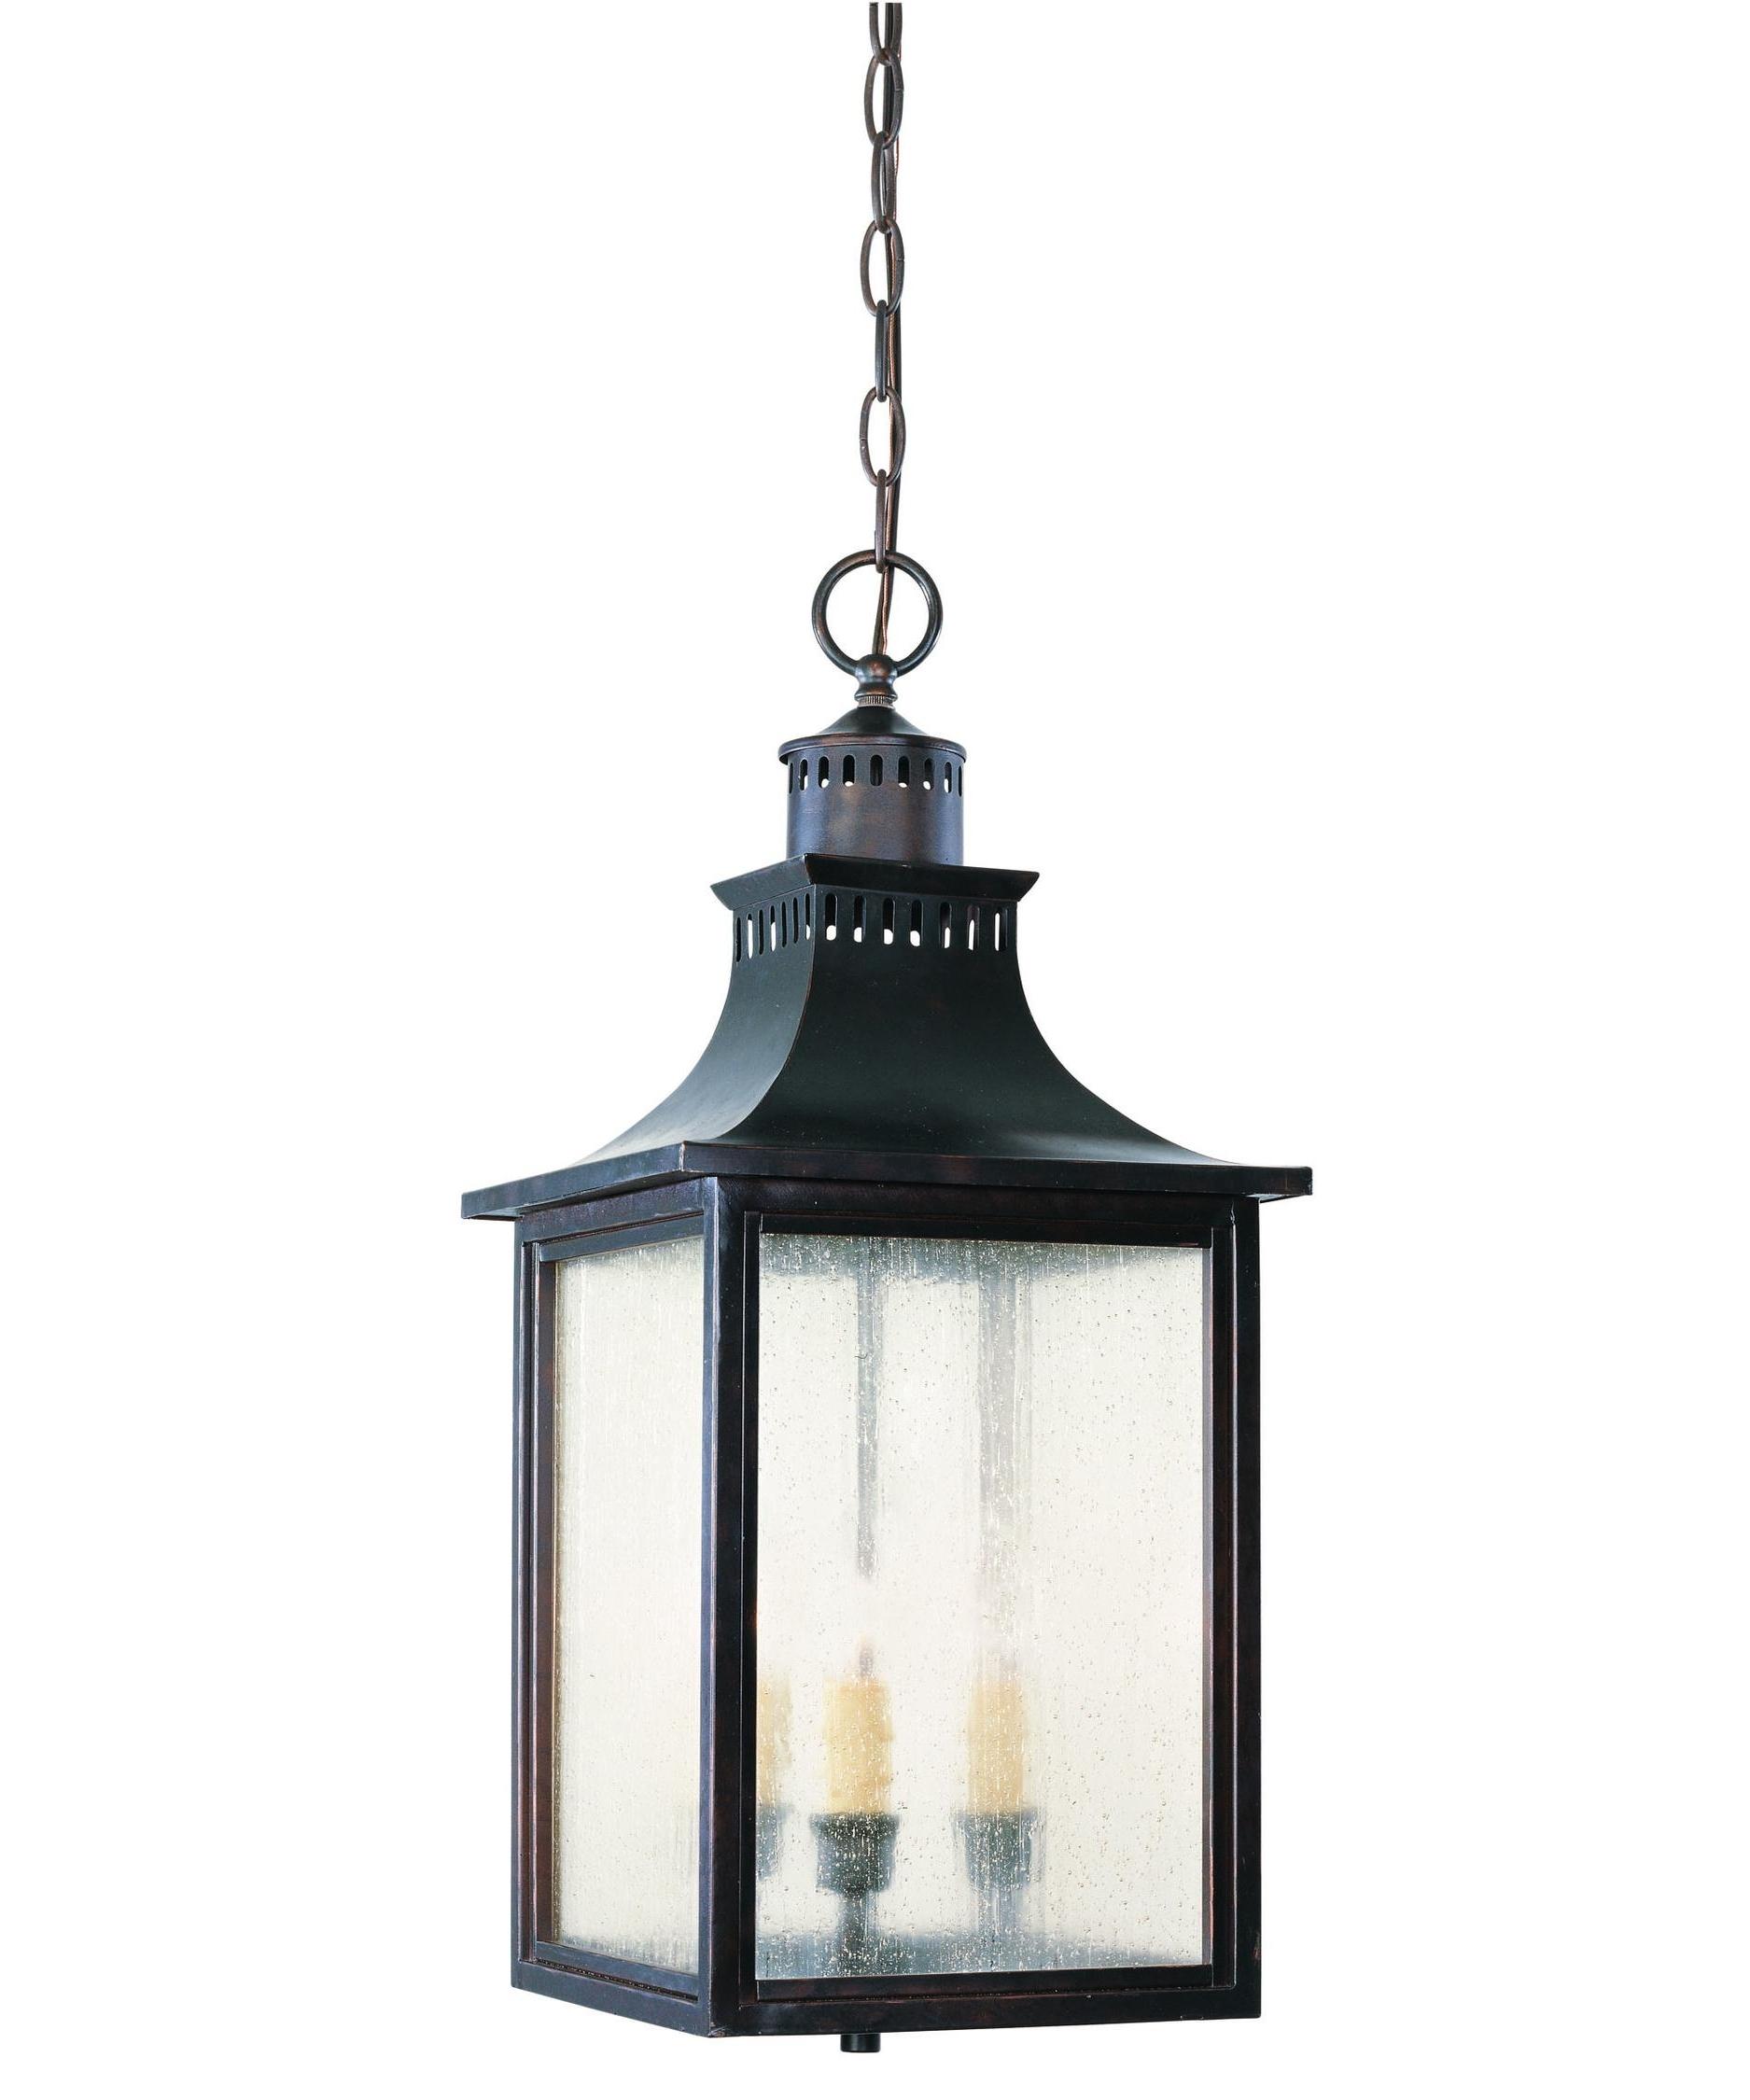 Popular Savoy House 5 256 Monte Grande 10 Inch Wide 3 Light Outdoor Hanging Regarding Outdoor Hanging Lantern Lights (View 6 of 20)